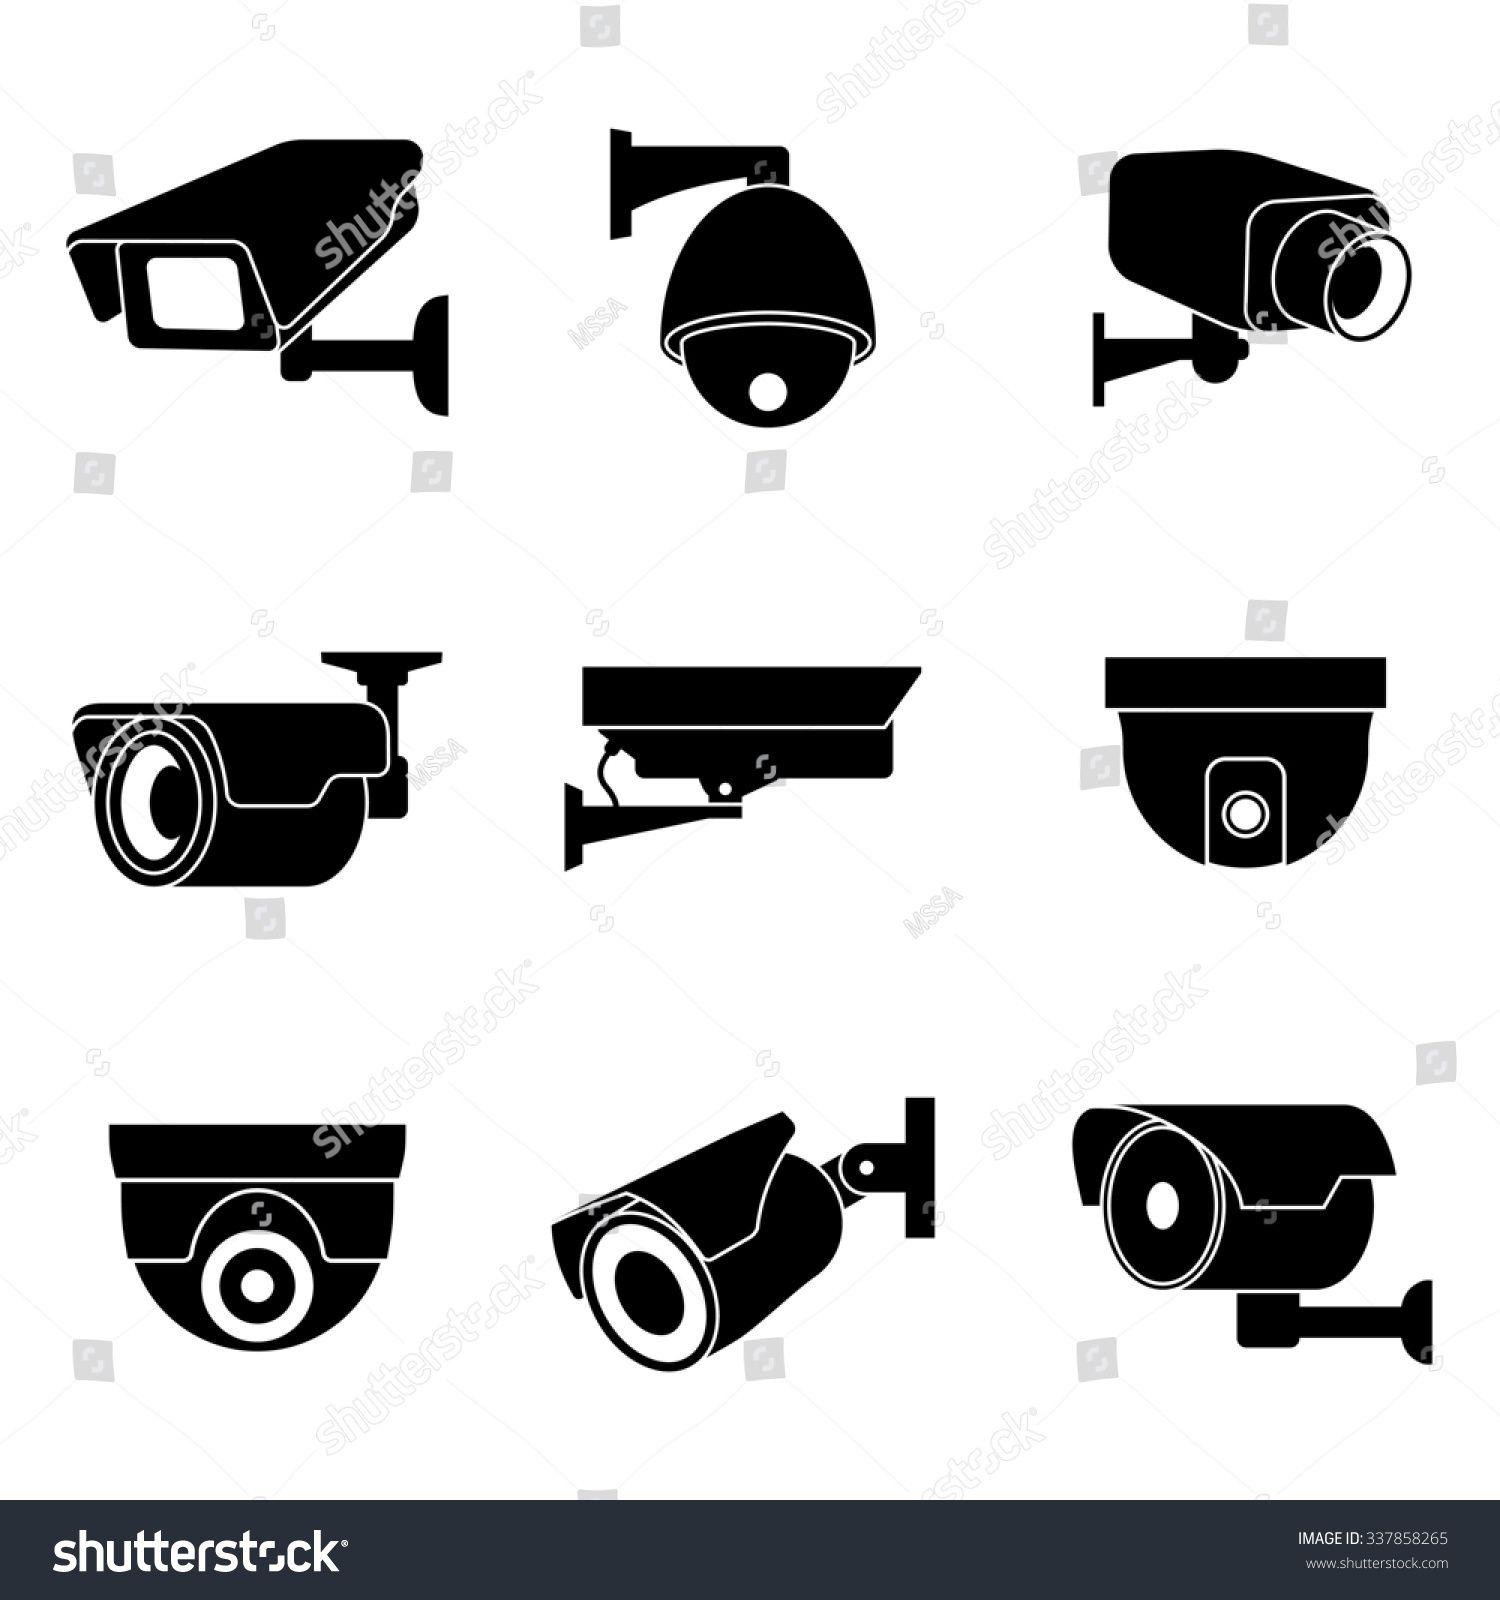 Security surveillance camera, CCTV icons Sponsored , AD